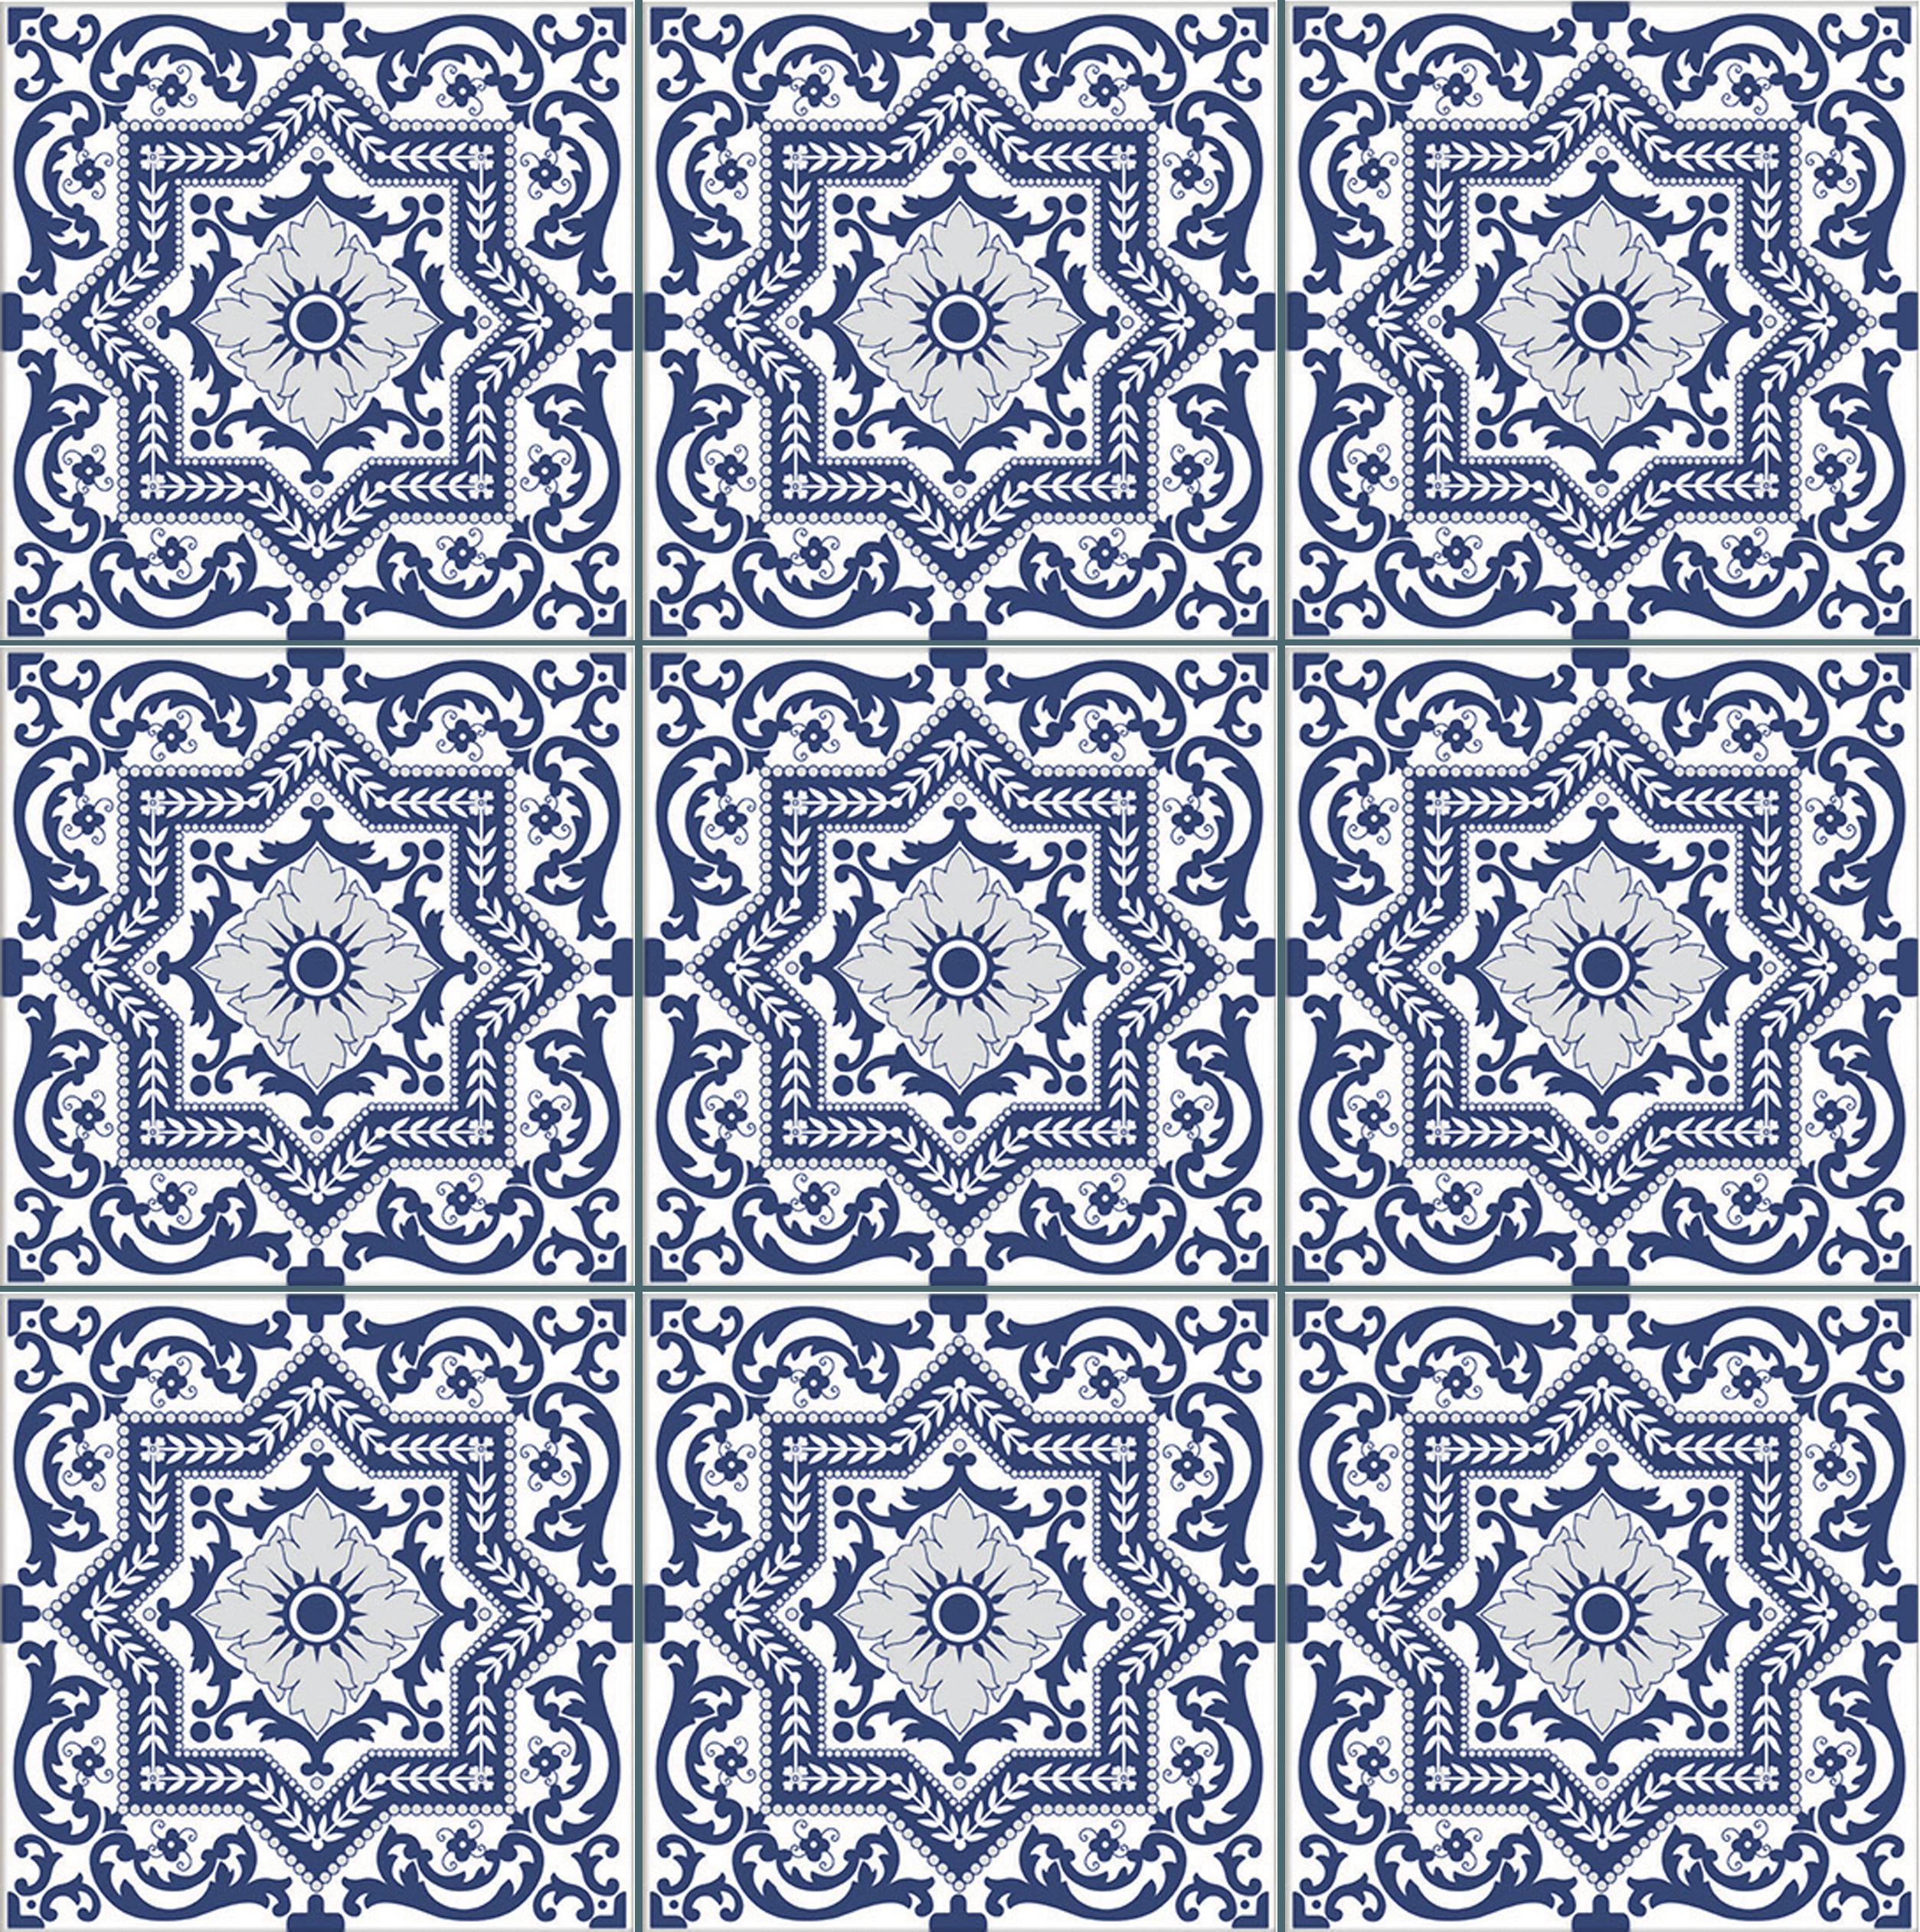 Cordova 6″ x 6″ (Ancient Series) Porcelain Pool Tile